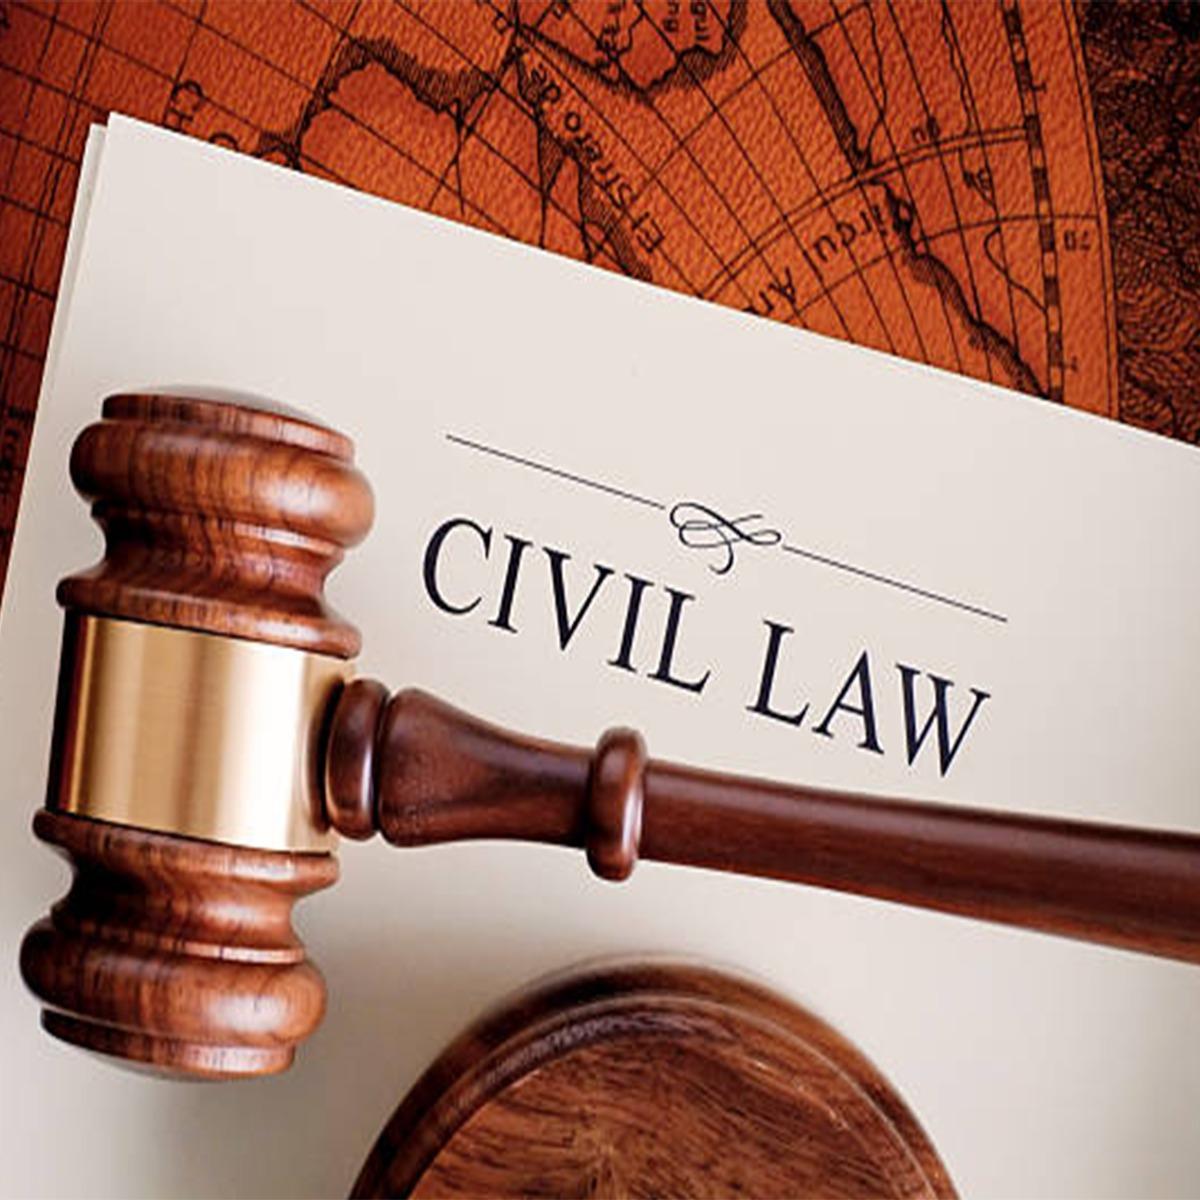 Civil Matter and Cop